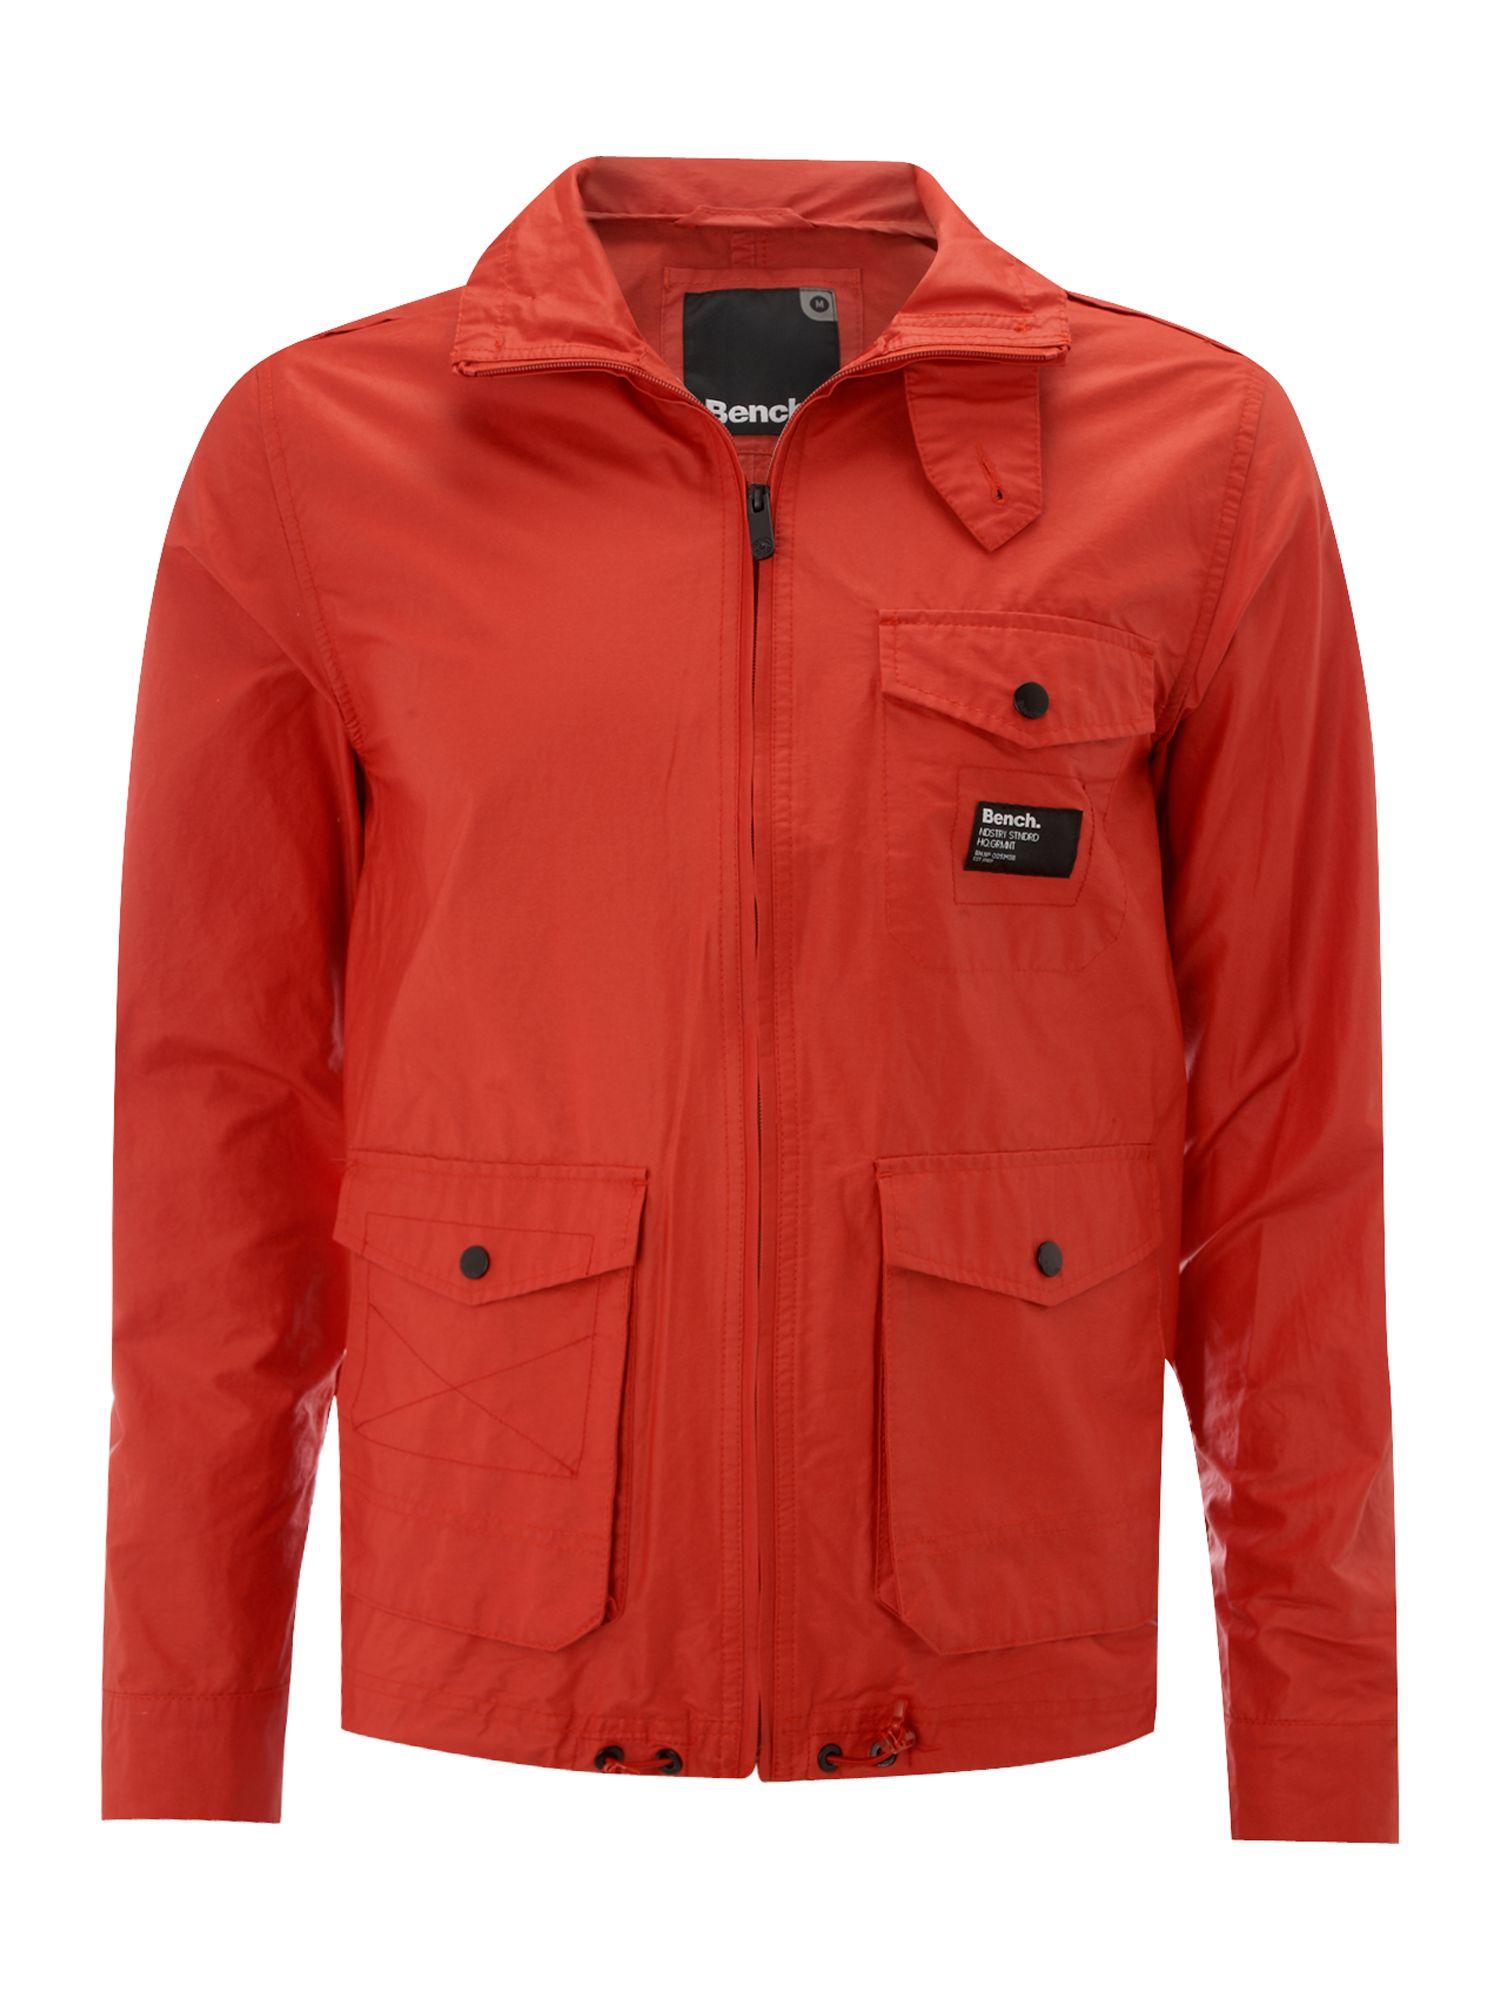 Red Bench Jacket 28 Images Bench Men S Ivib Lightweight Jacket Red Clothing Zavvi Com Bench